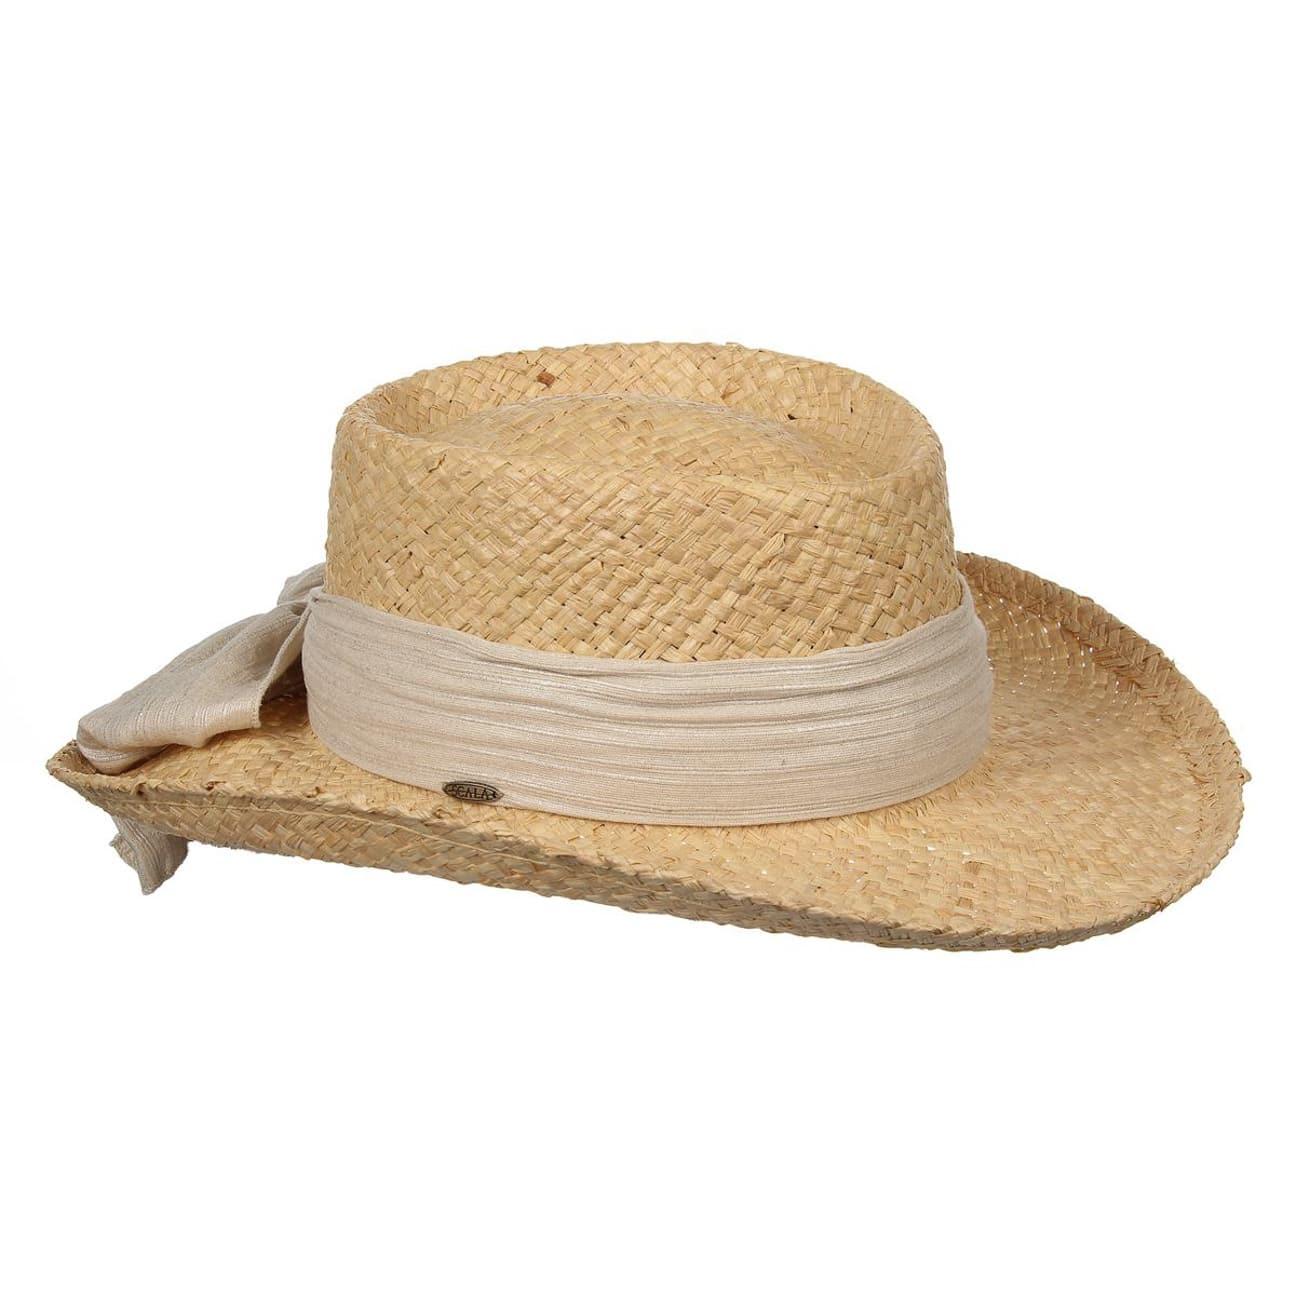 Gambler Women's Straw Hat